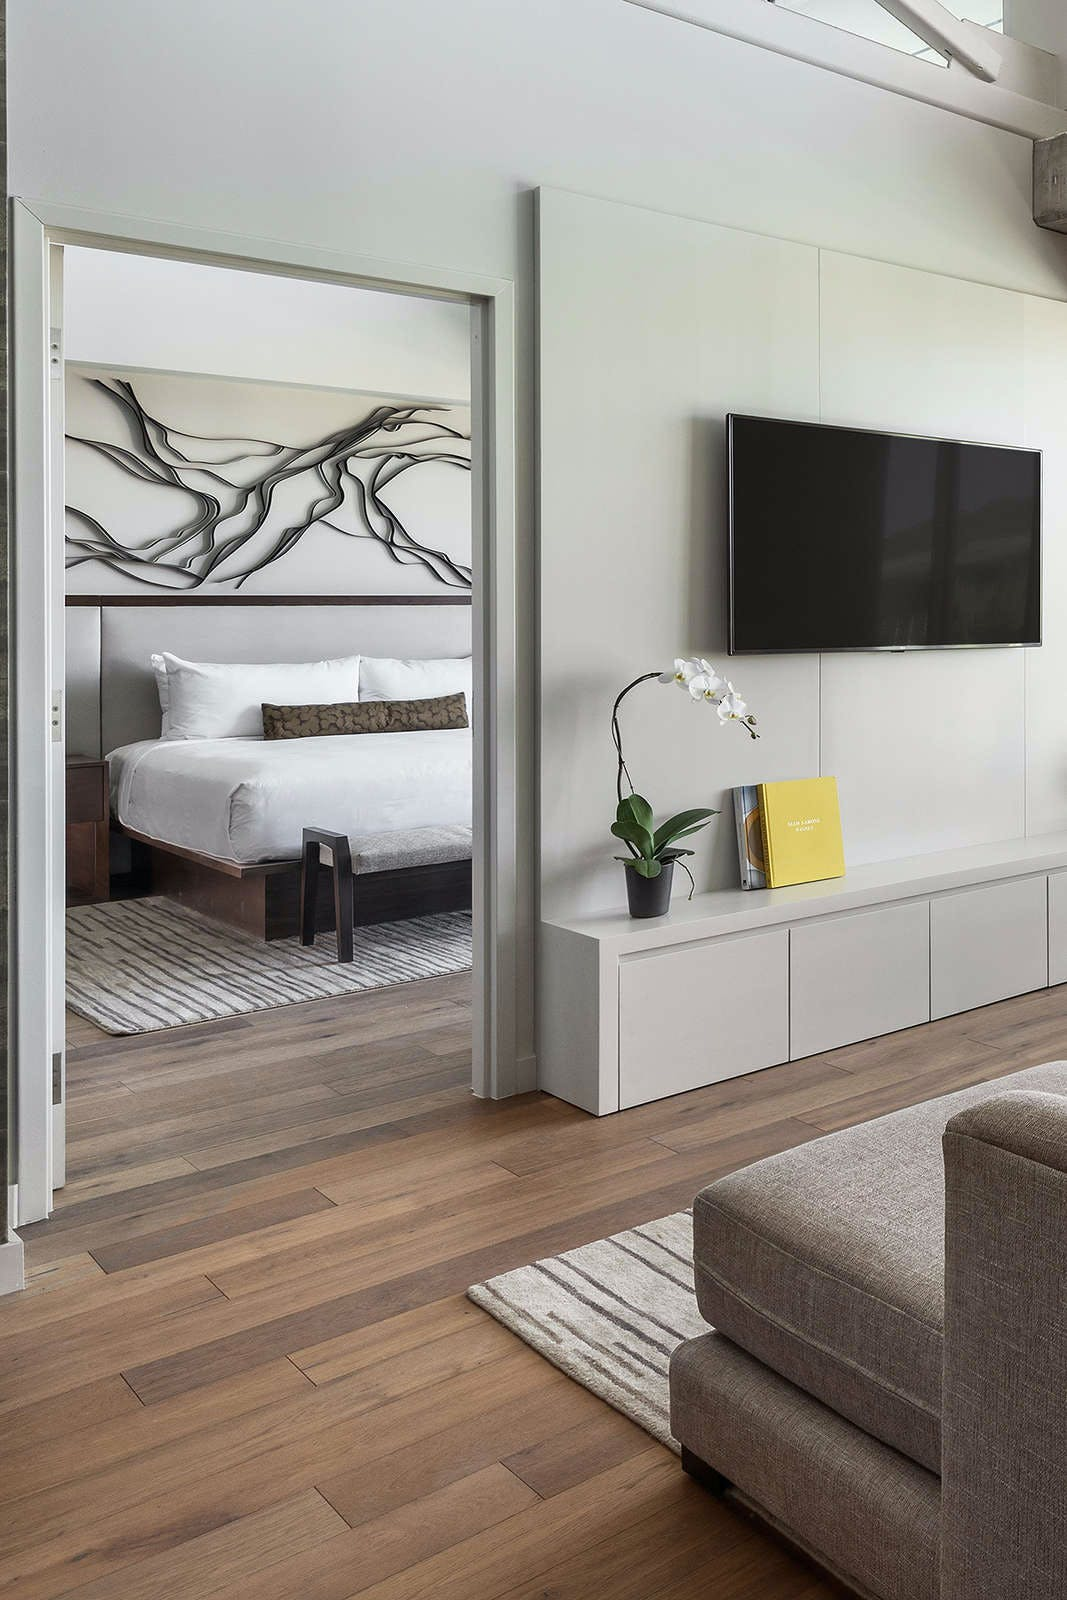 Mountain Shadows - One Bedroom Studio Suite